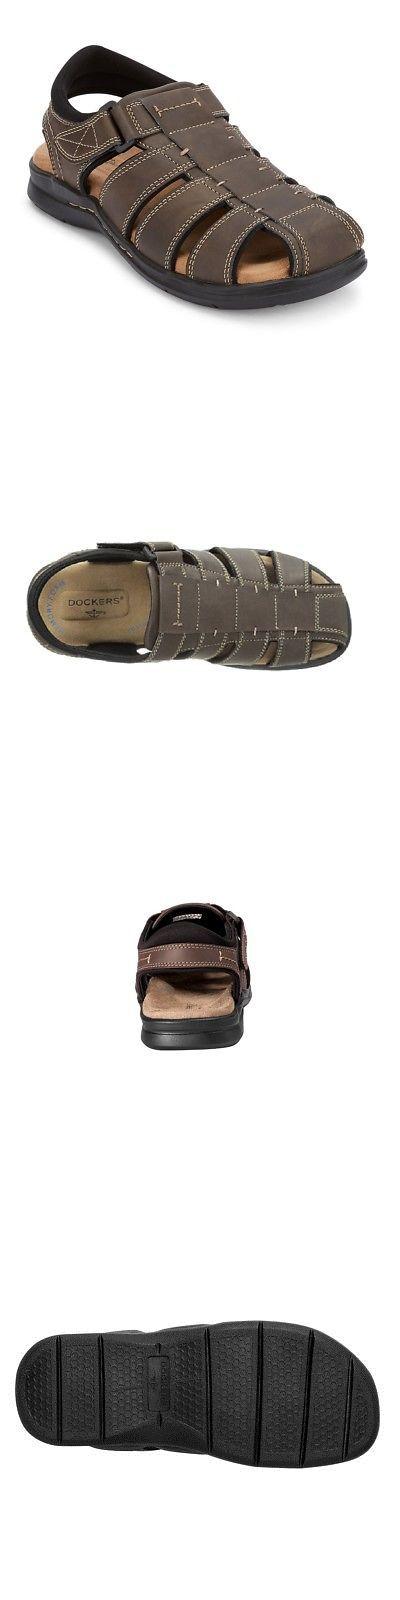 b6702115809 Sandals 11504  Dockers Mens Marin Casual Comfort Outdoor Sport Fisherman  Sandal Shoe -  BUY IT NOW ONLY   34.99 on  eBay  sandals  dockers  marin   casual ...